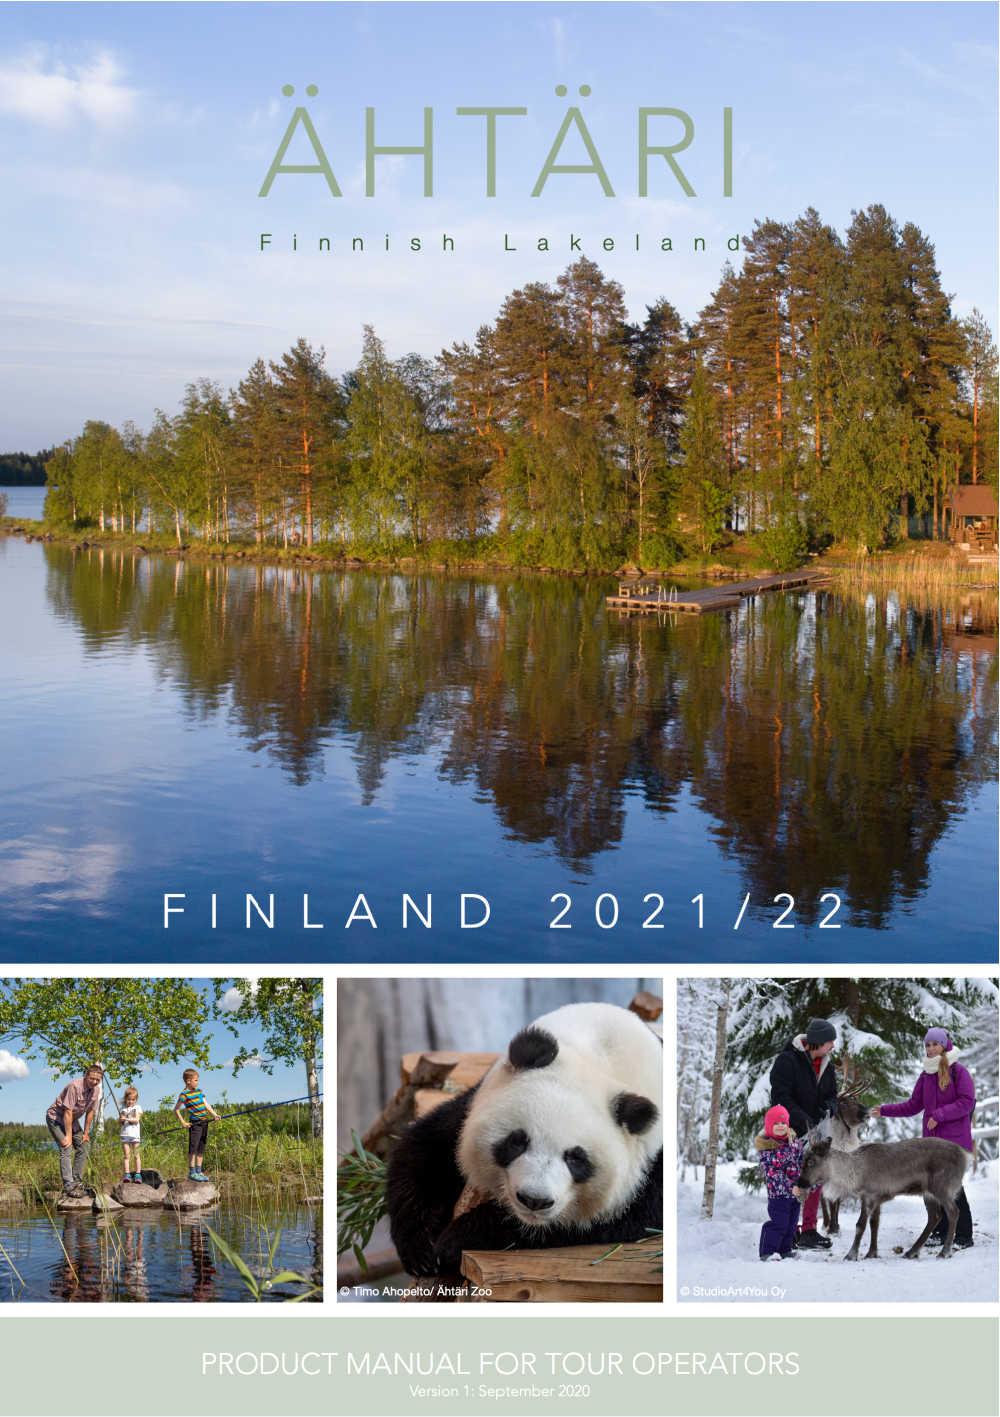 Product Manual-Ahtari-Finland-2021-22-EN